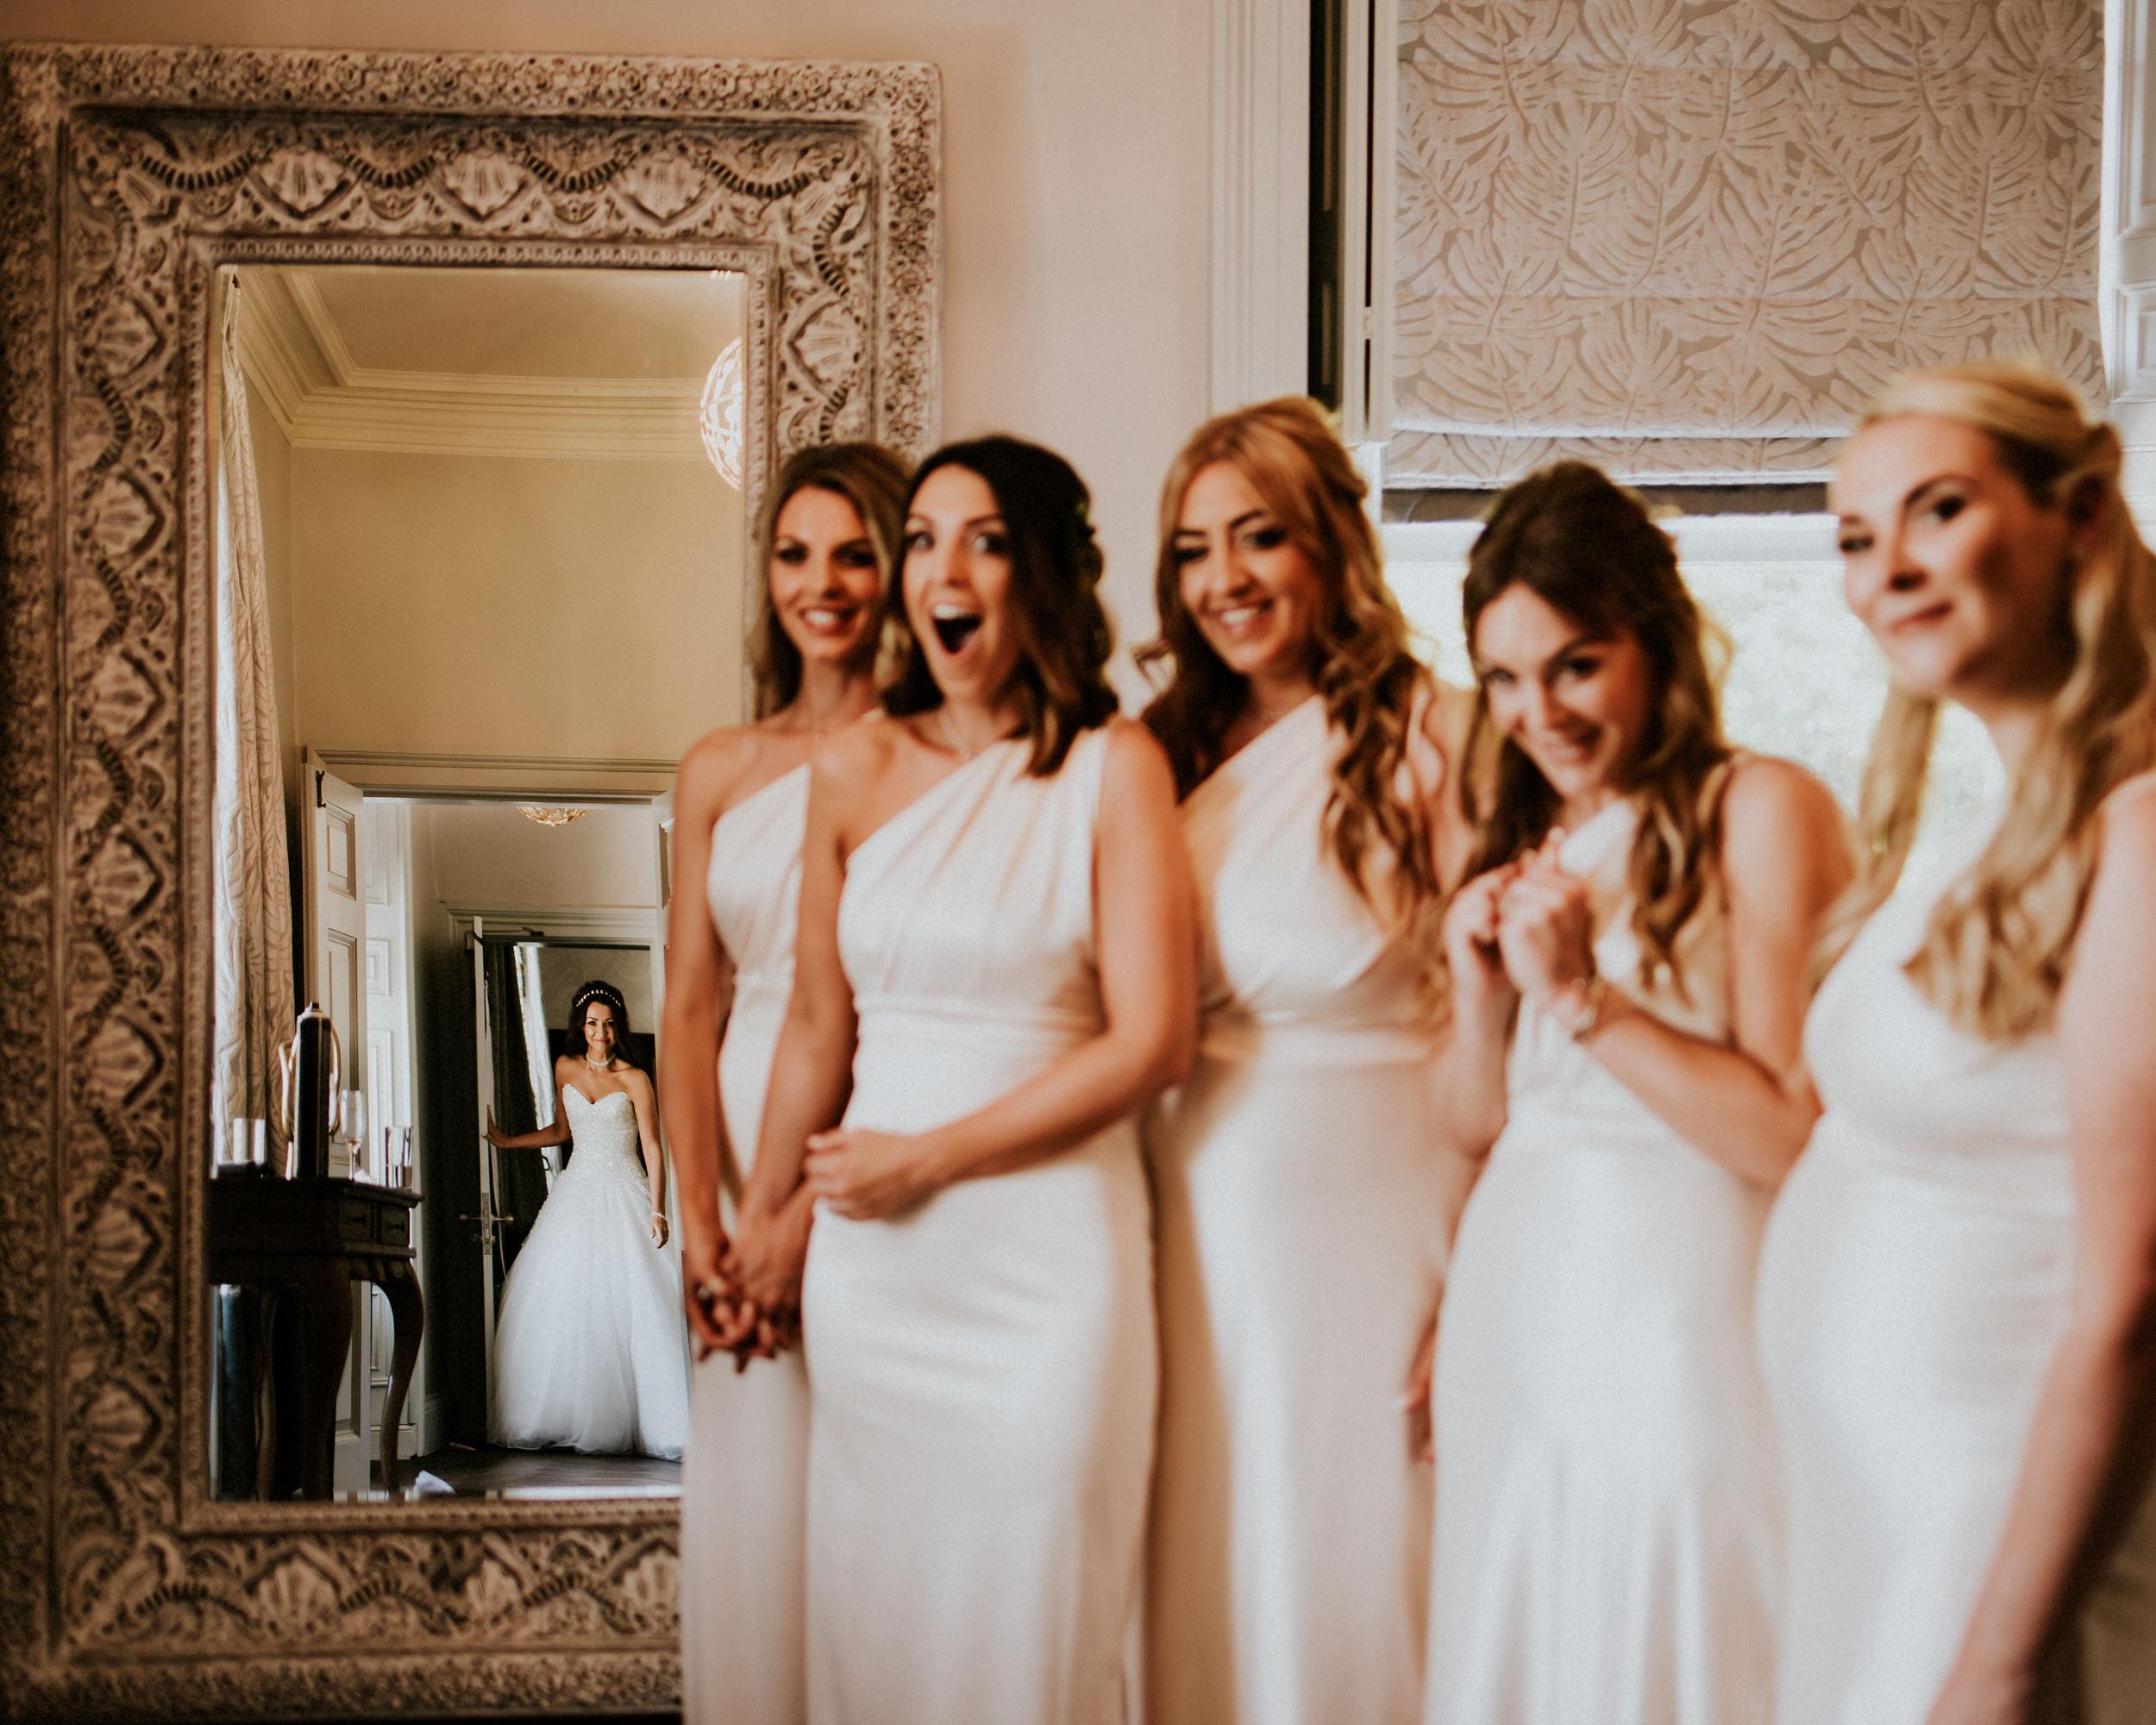 saltmarshe-hall-wedding-photos-shutter-go-click-yorkshire-creative-wedding-photographer-shutter-go-click-36.jpg